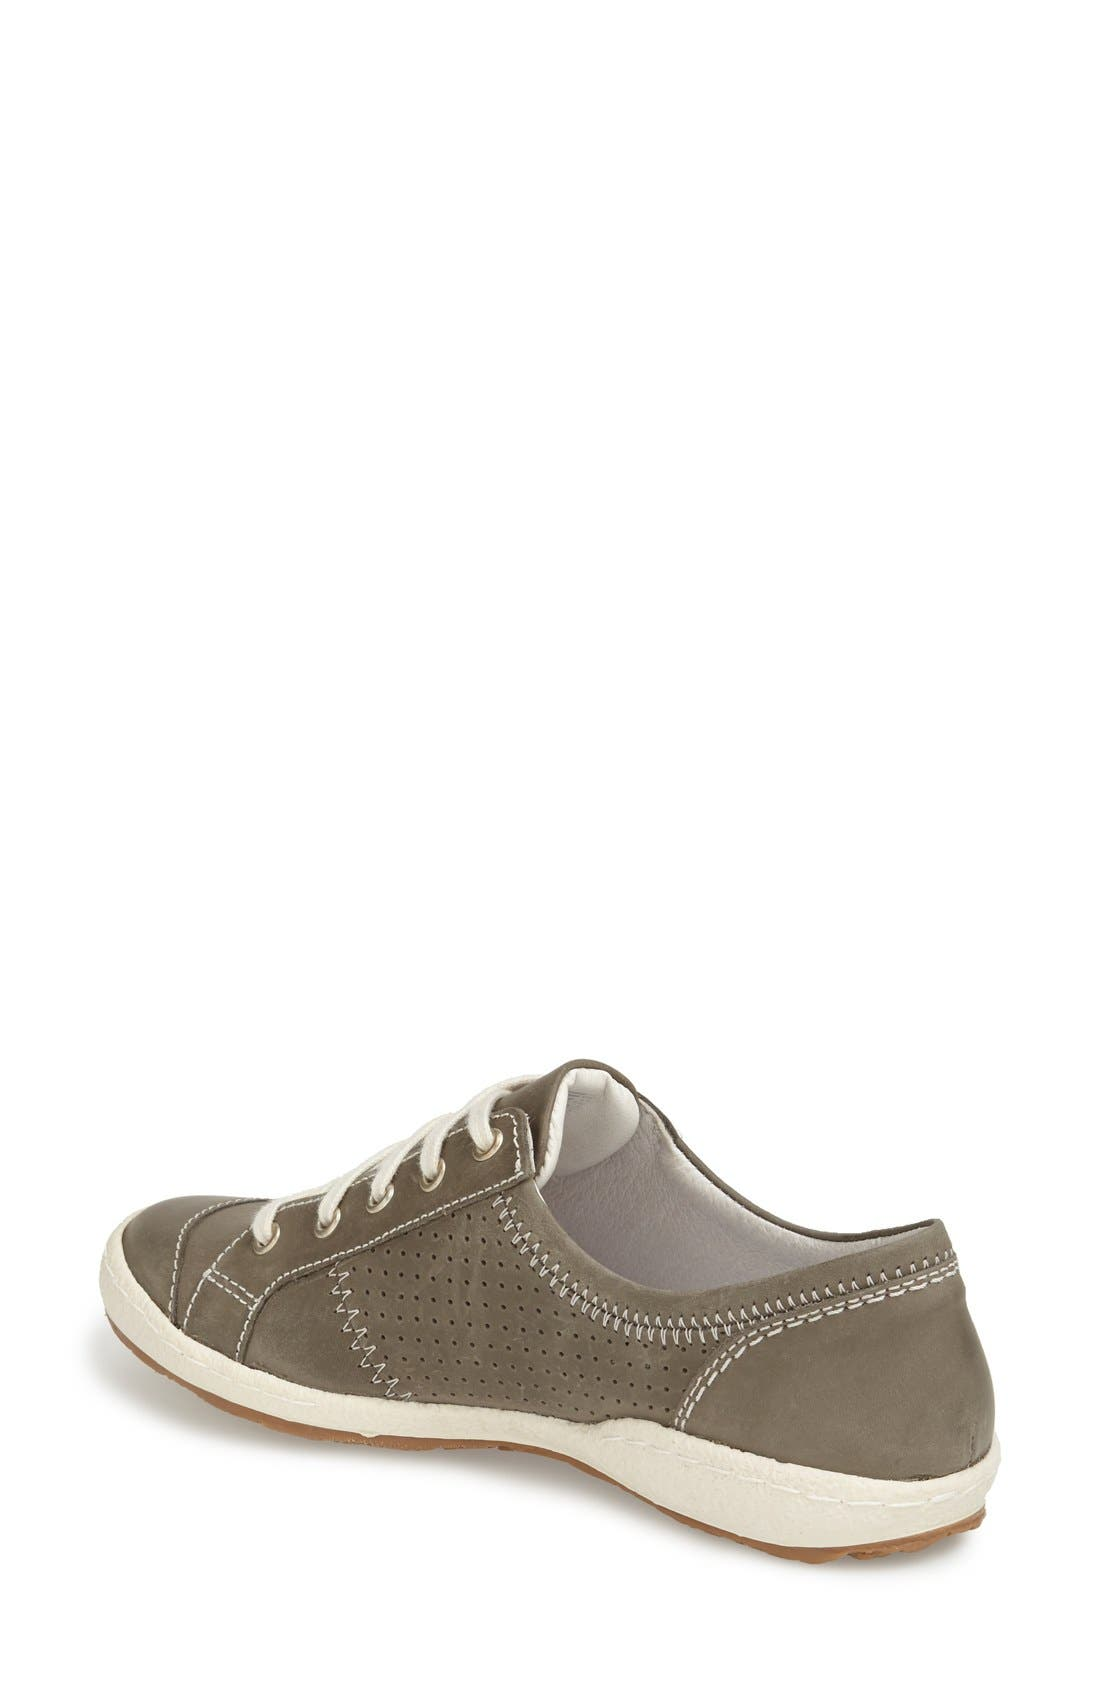 'Caspian' Sneaker,                             Alternate thumbnail 2, color,                             Grigio Leather